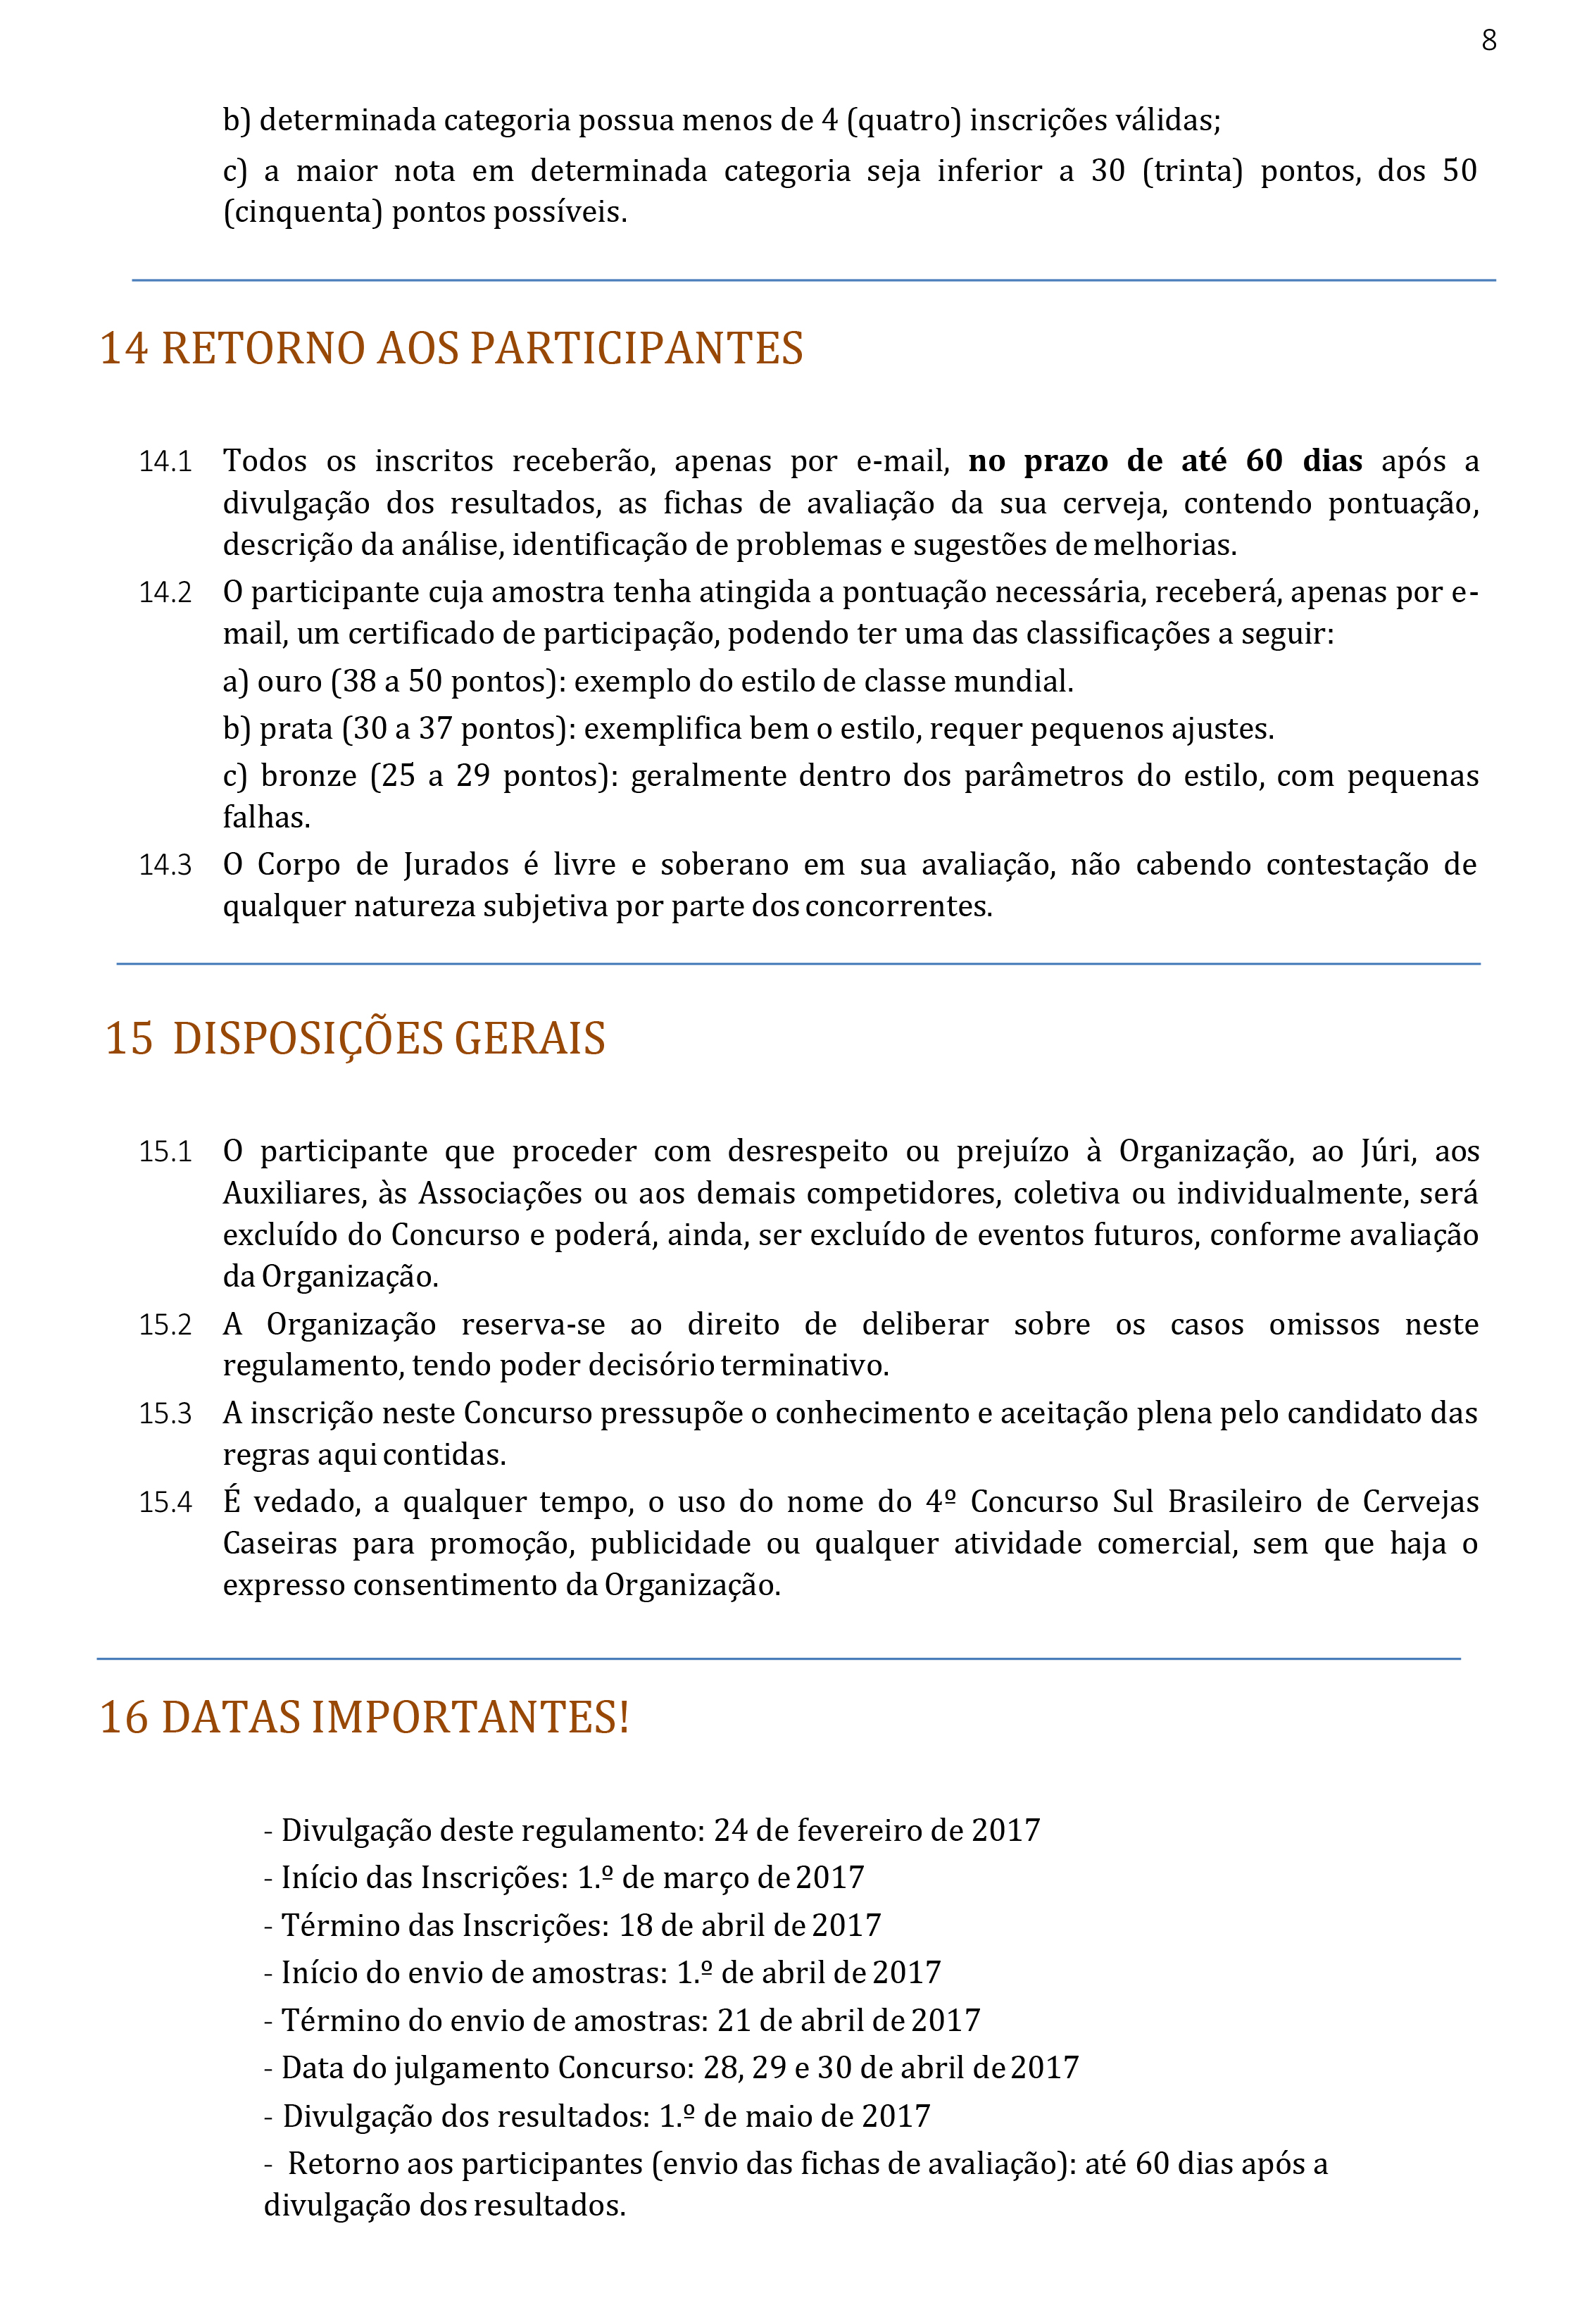 IV Concurso Sulbrasileiro 2017-Regulamento-8.jpg